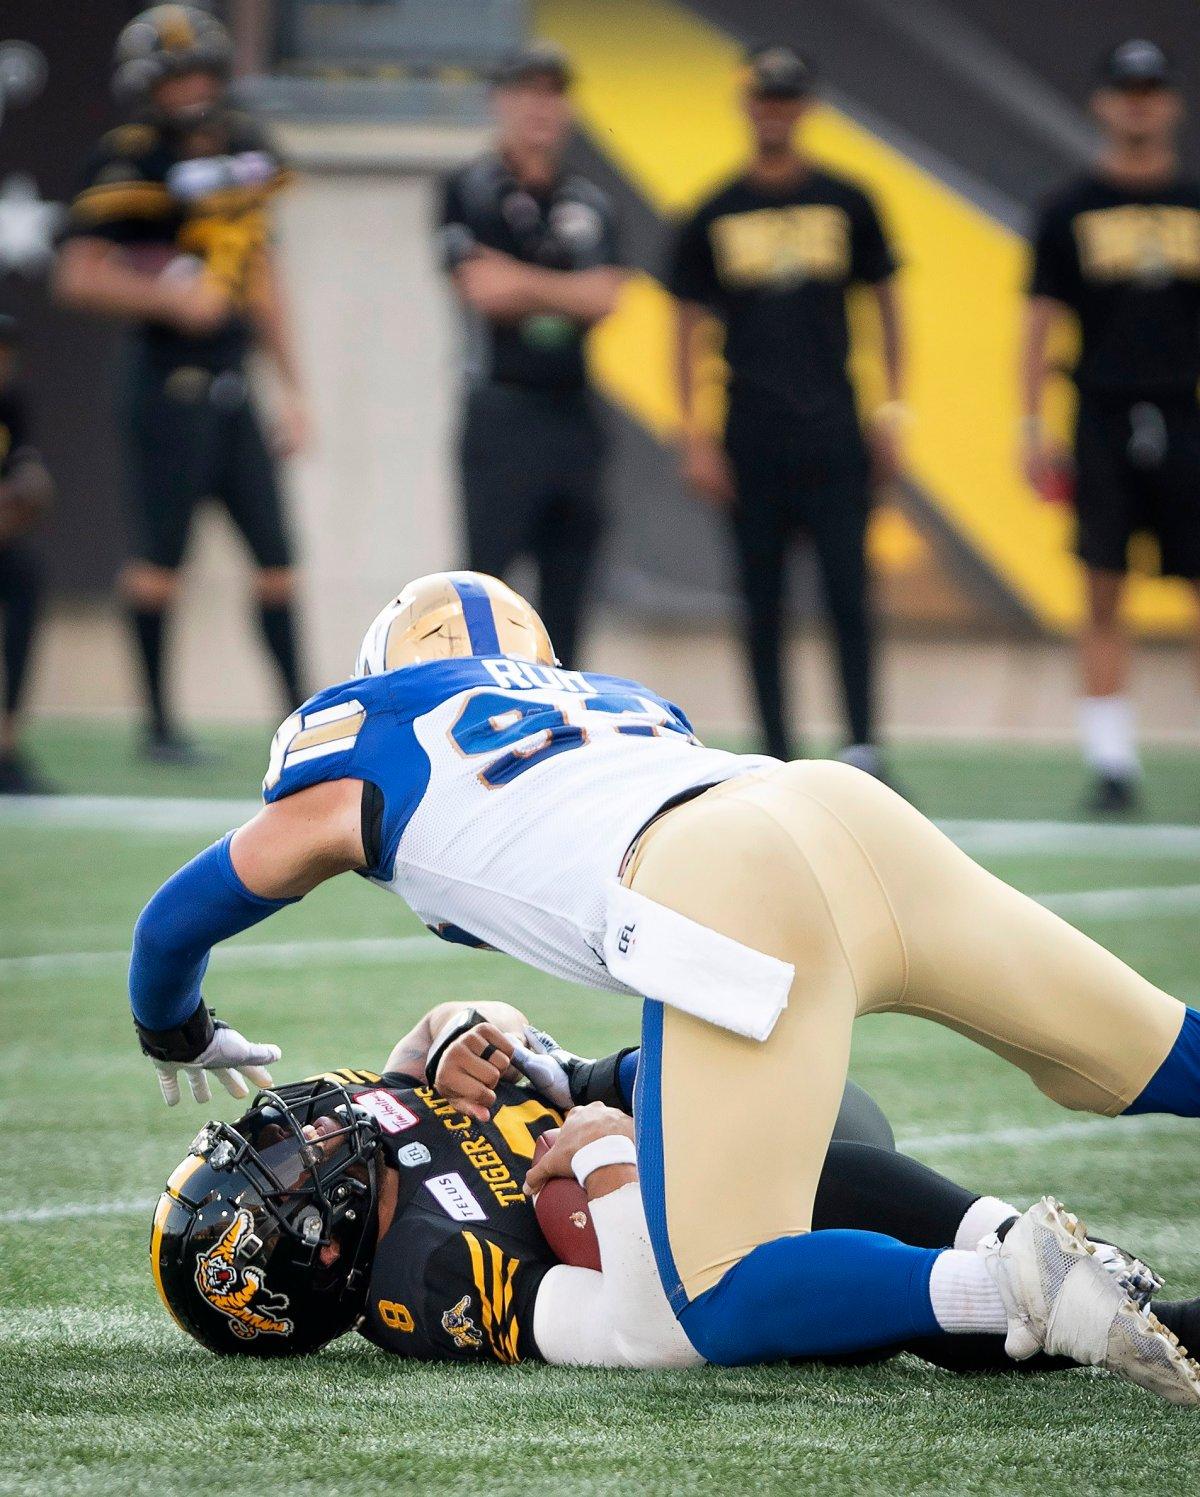 Winnipeg Blue Bombers defensive lineman Craig Roh goes over Hamilton Tiger-Cats quarterback Jeremiah Masoli during first half of game at Tim Hortons Field.